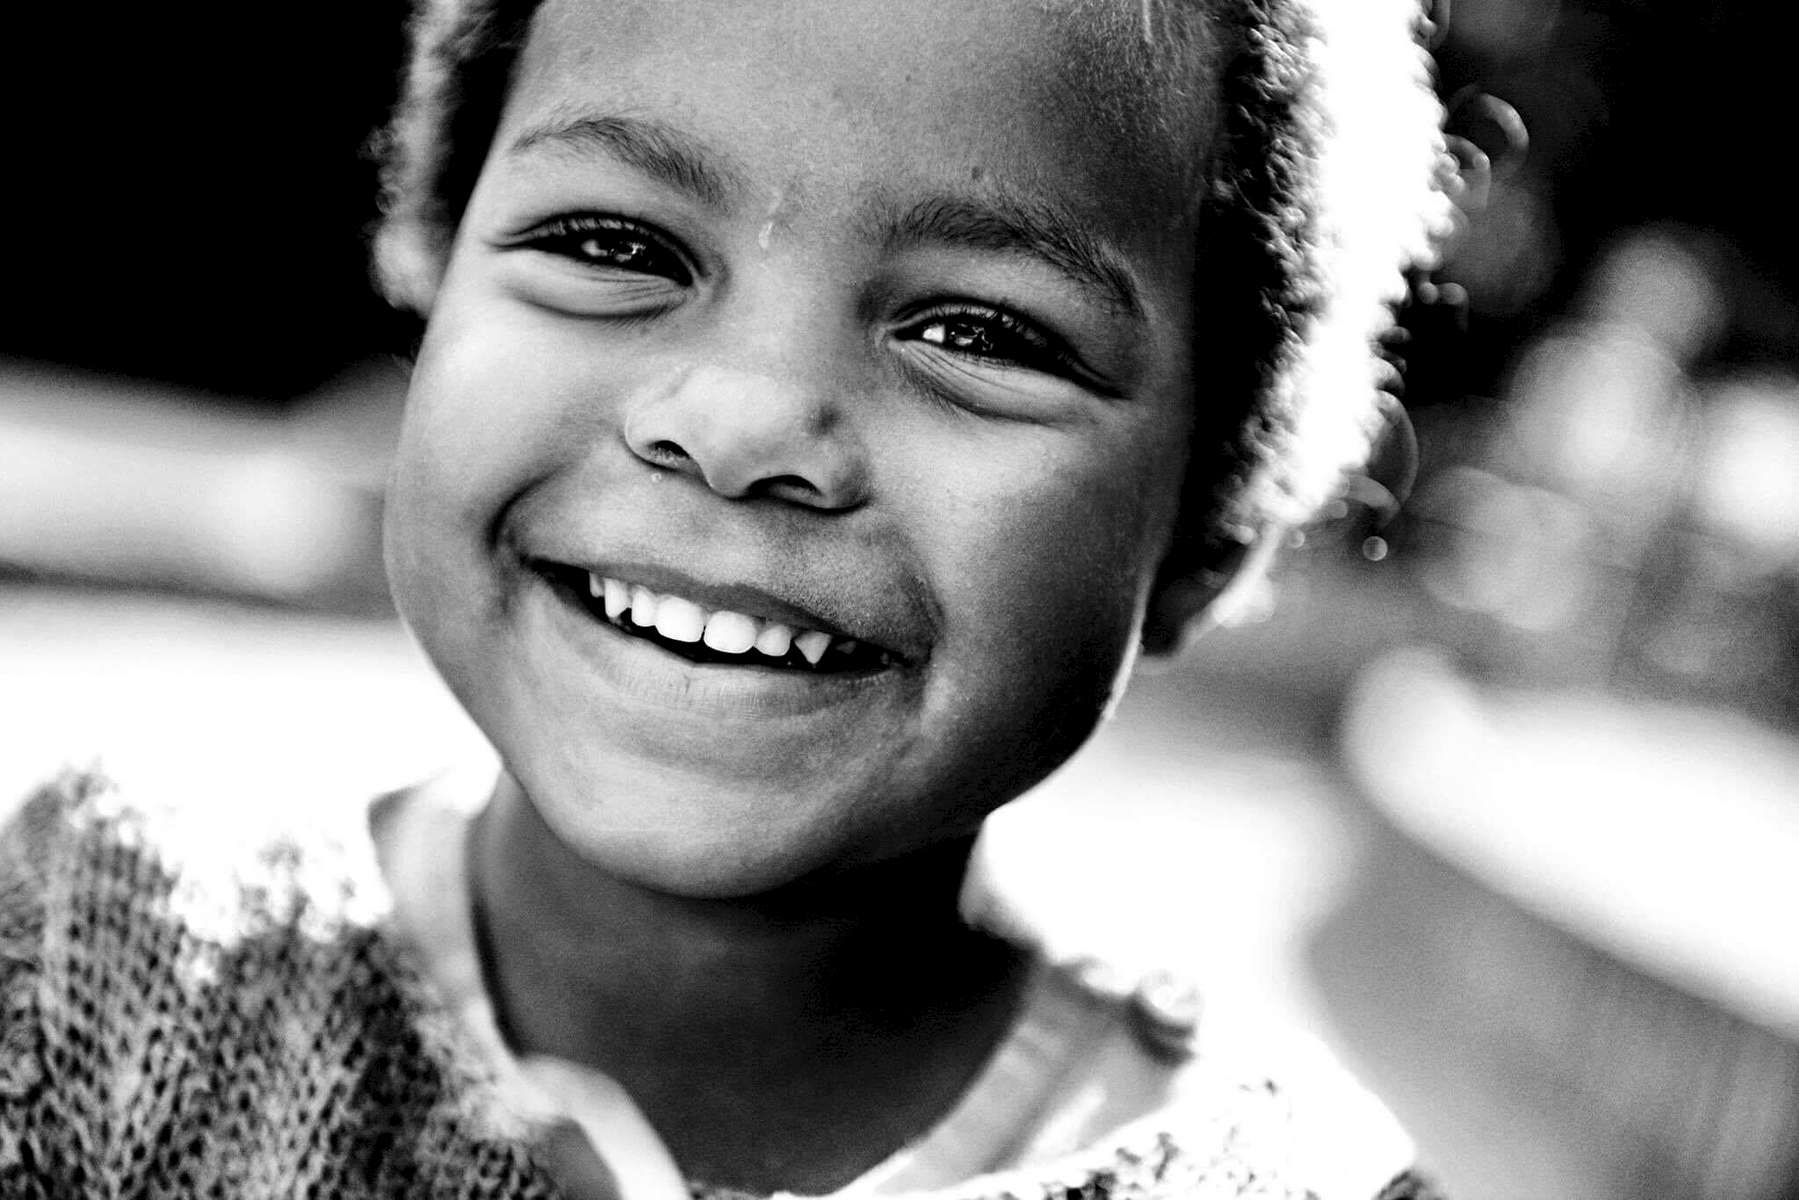 svartvit bild på ett barn